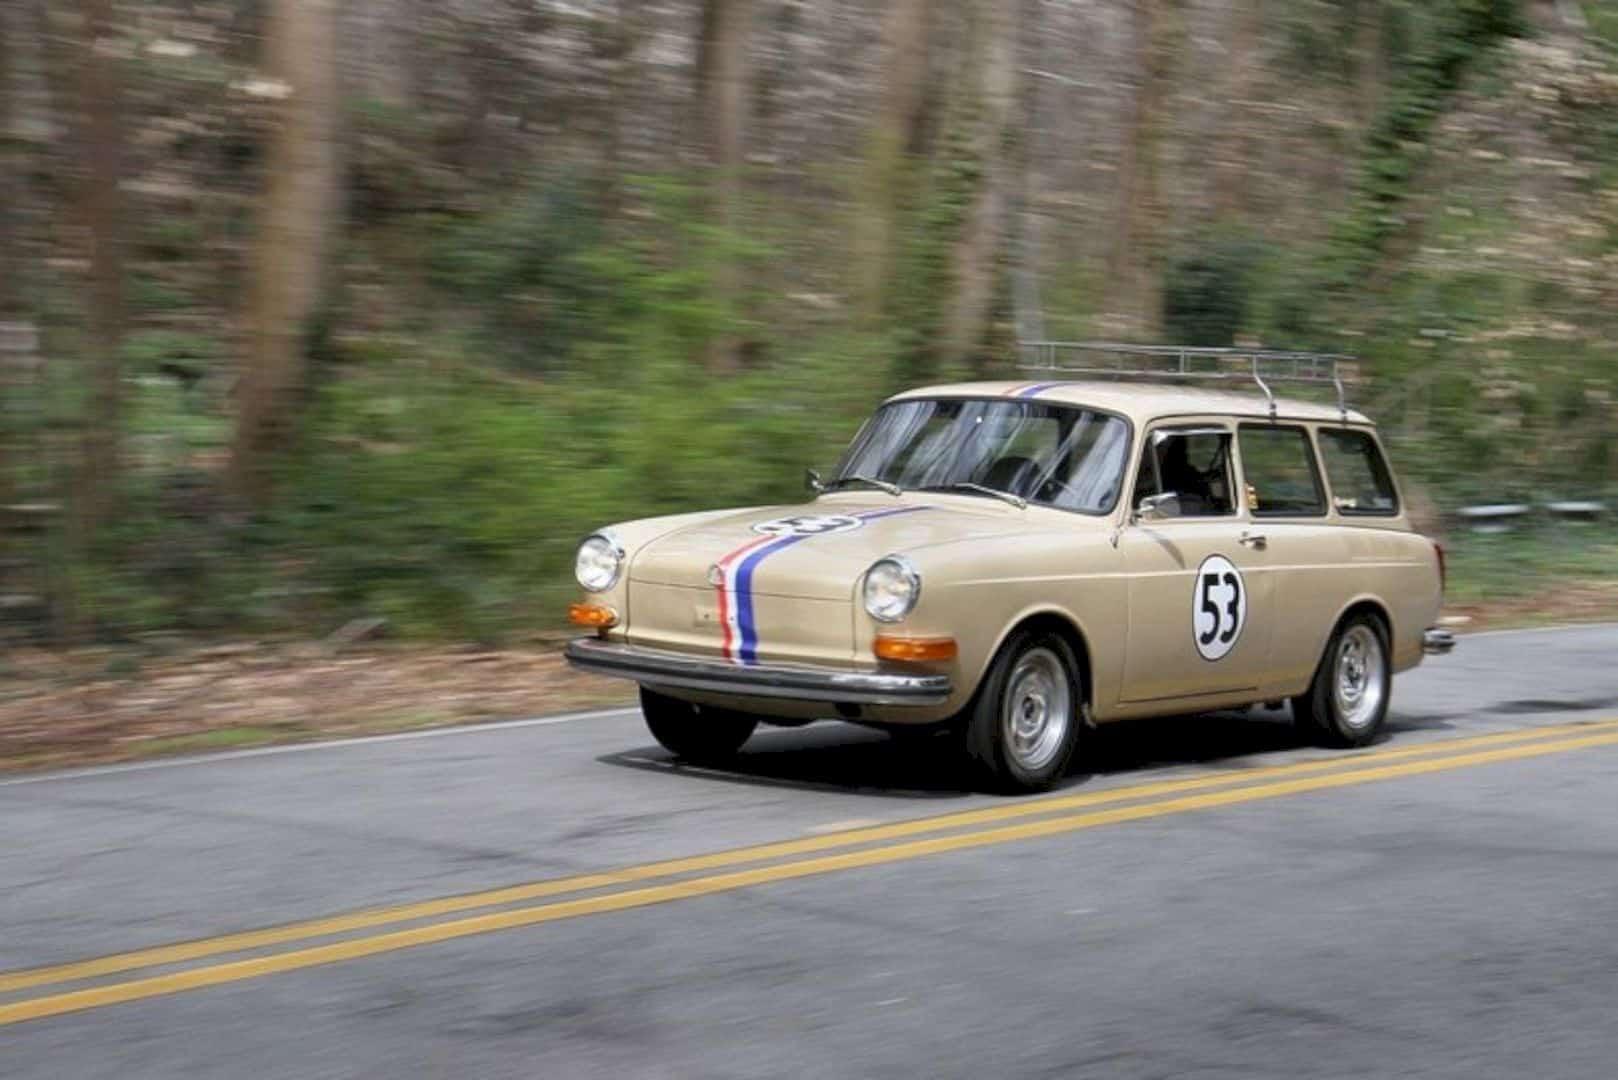 1972 Volkswagen Type 3 Squareback 1